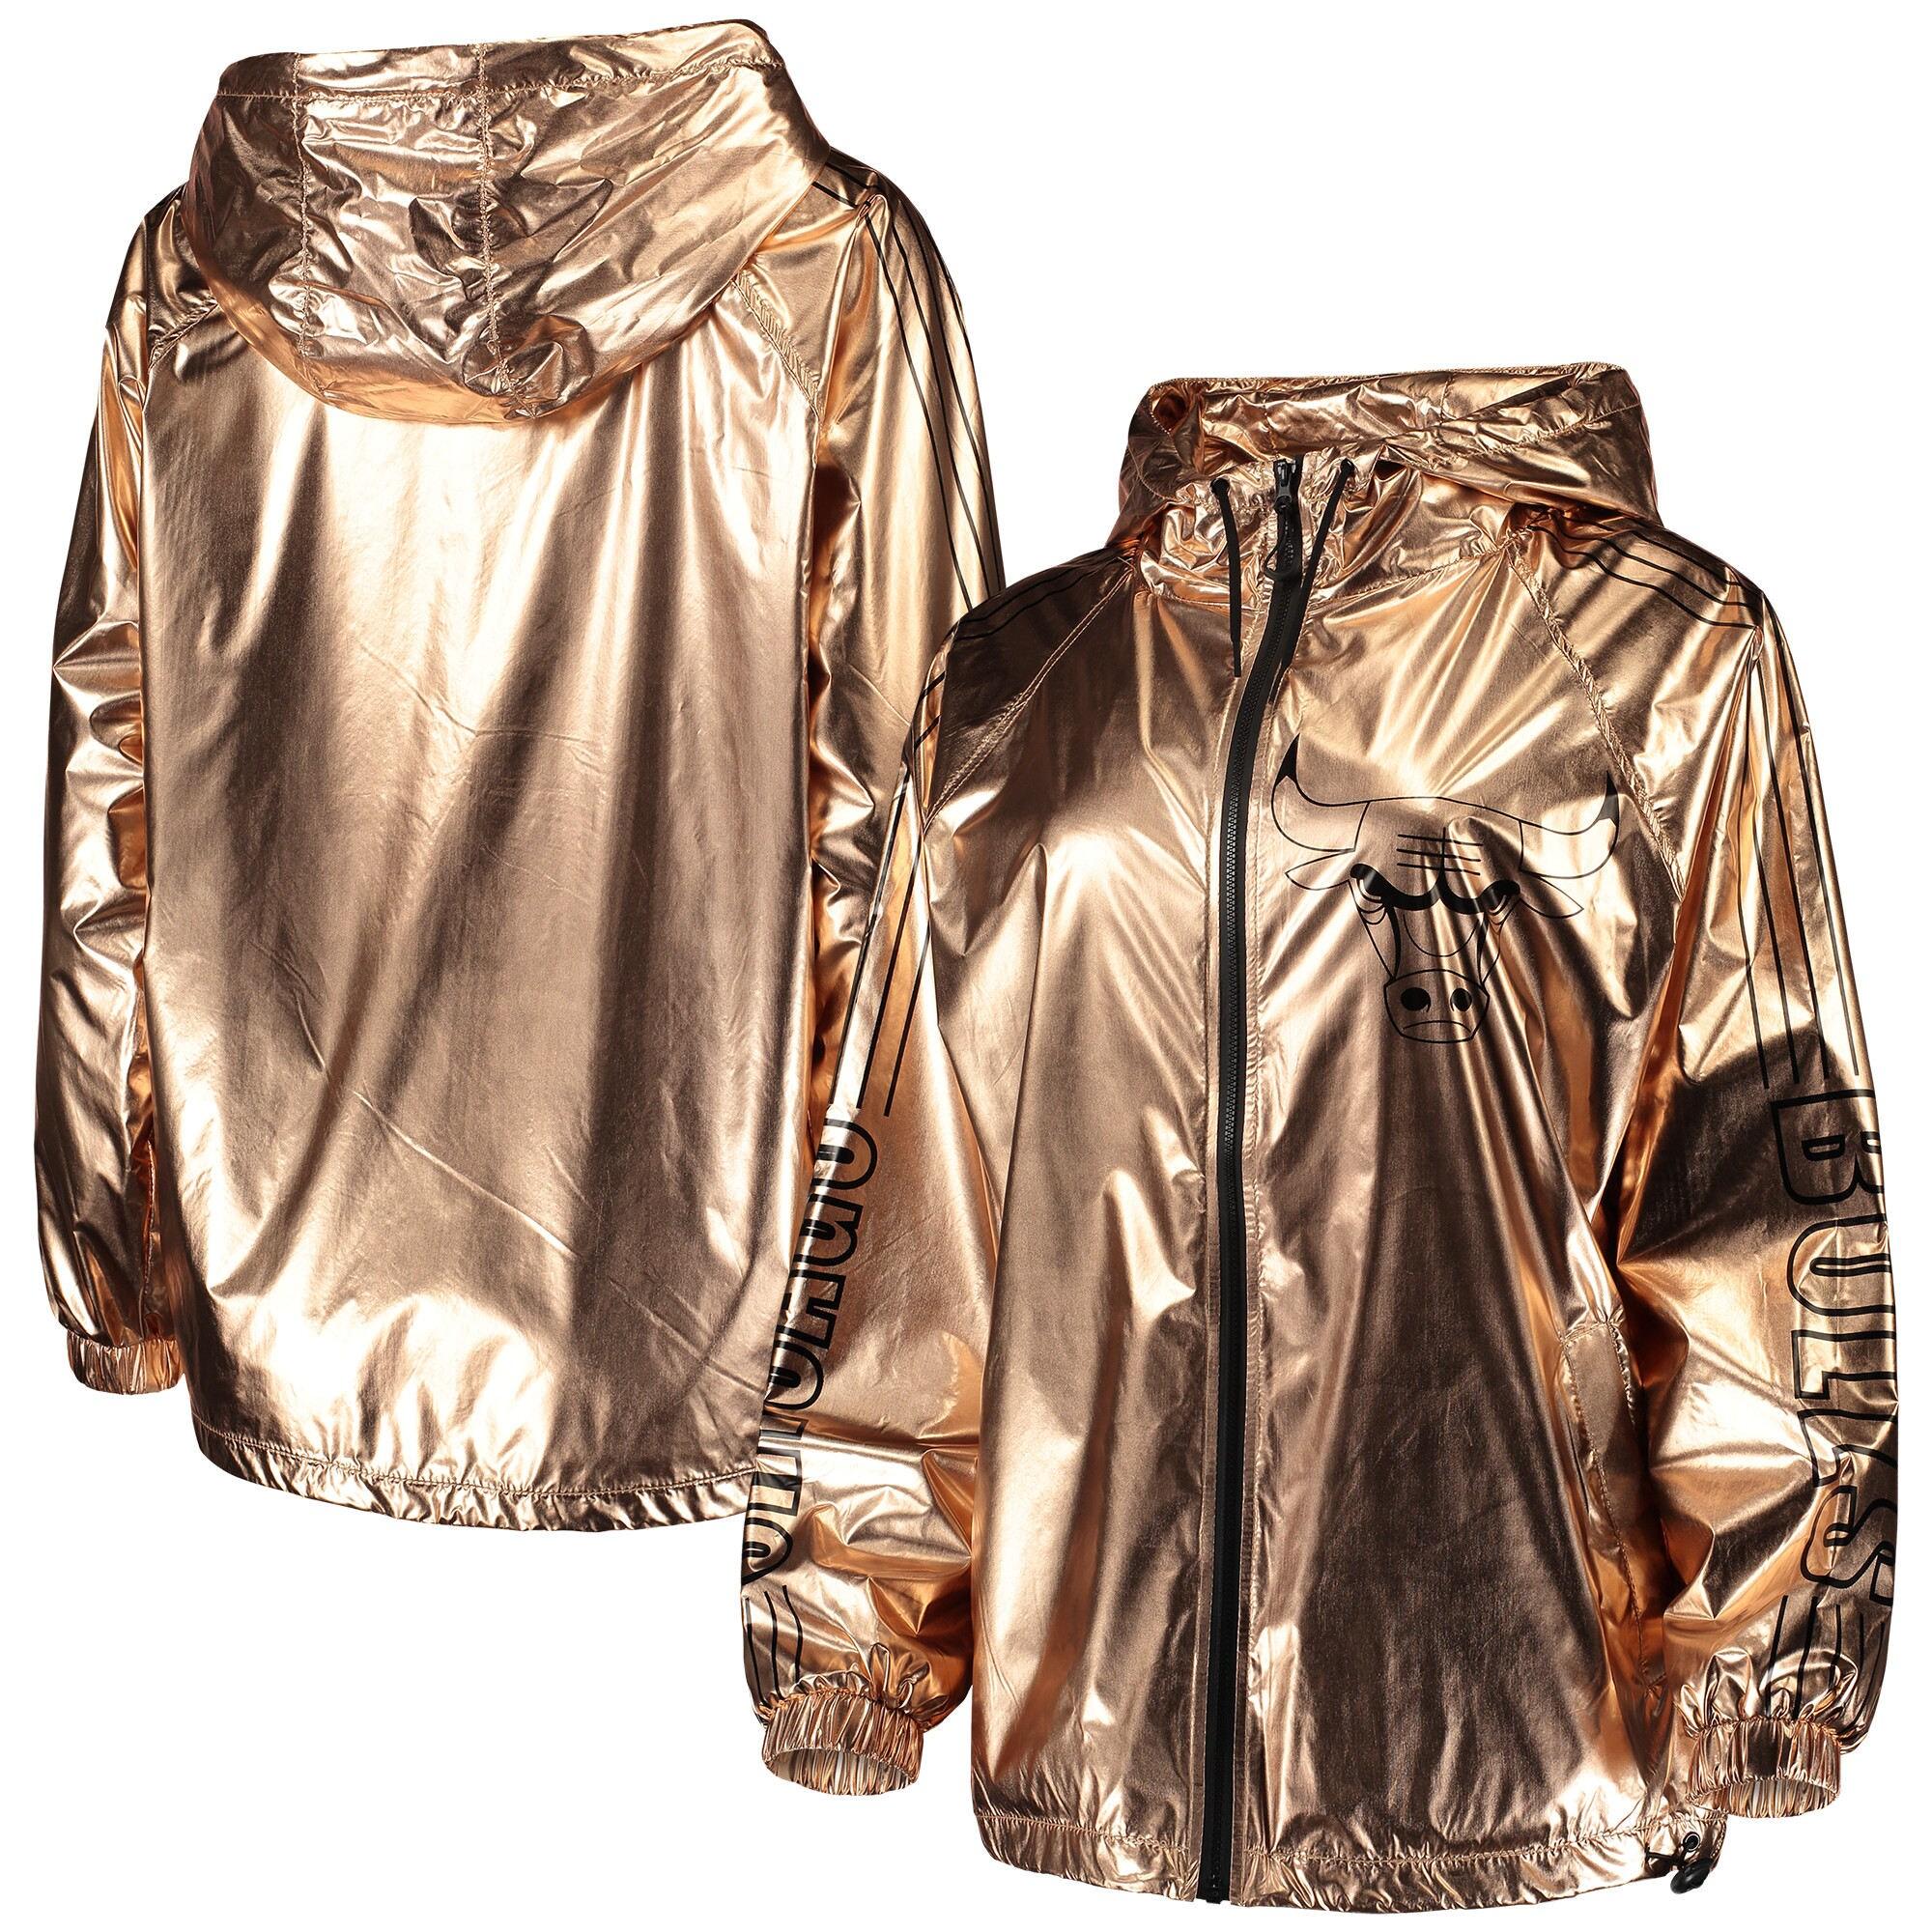 Chicago Bulls Touch by Alyssa Milano Women's Bring It Metallic Anorak Full-Zip Jacket - Rose Gold